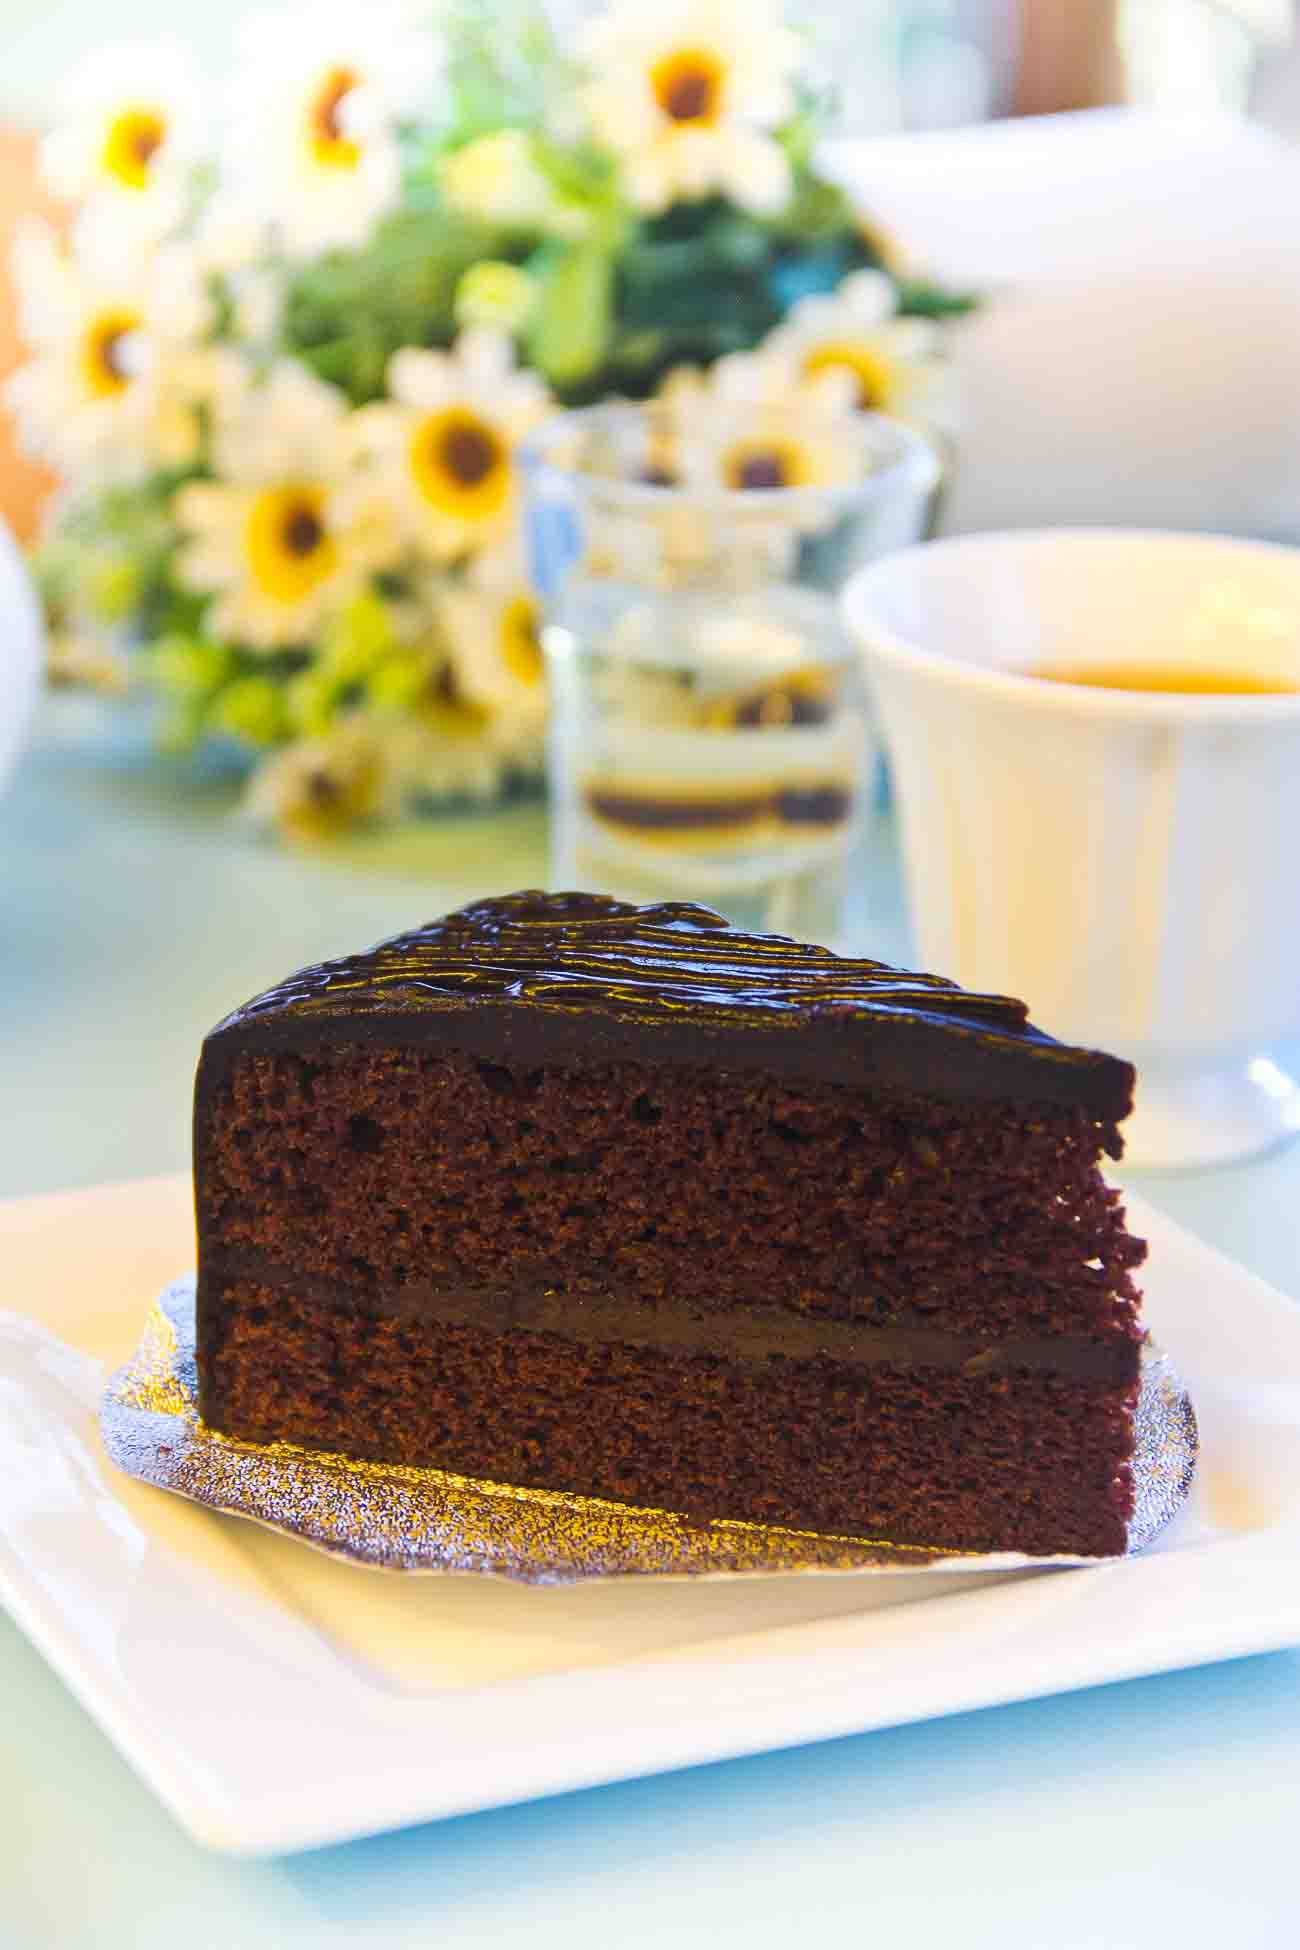 Layered Continental Cake Recipe